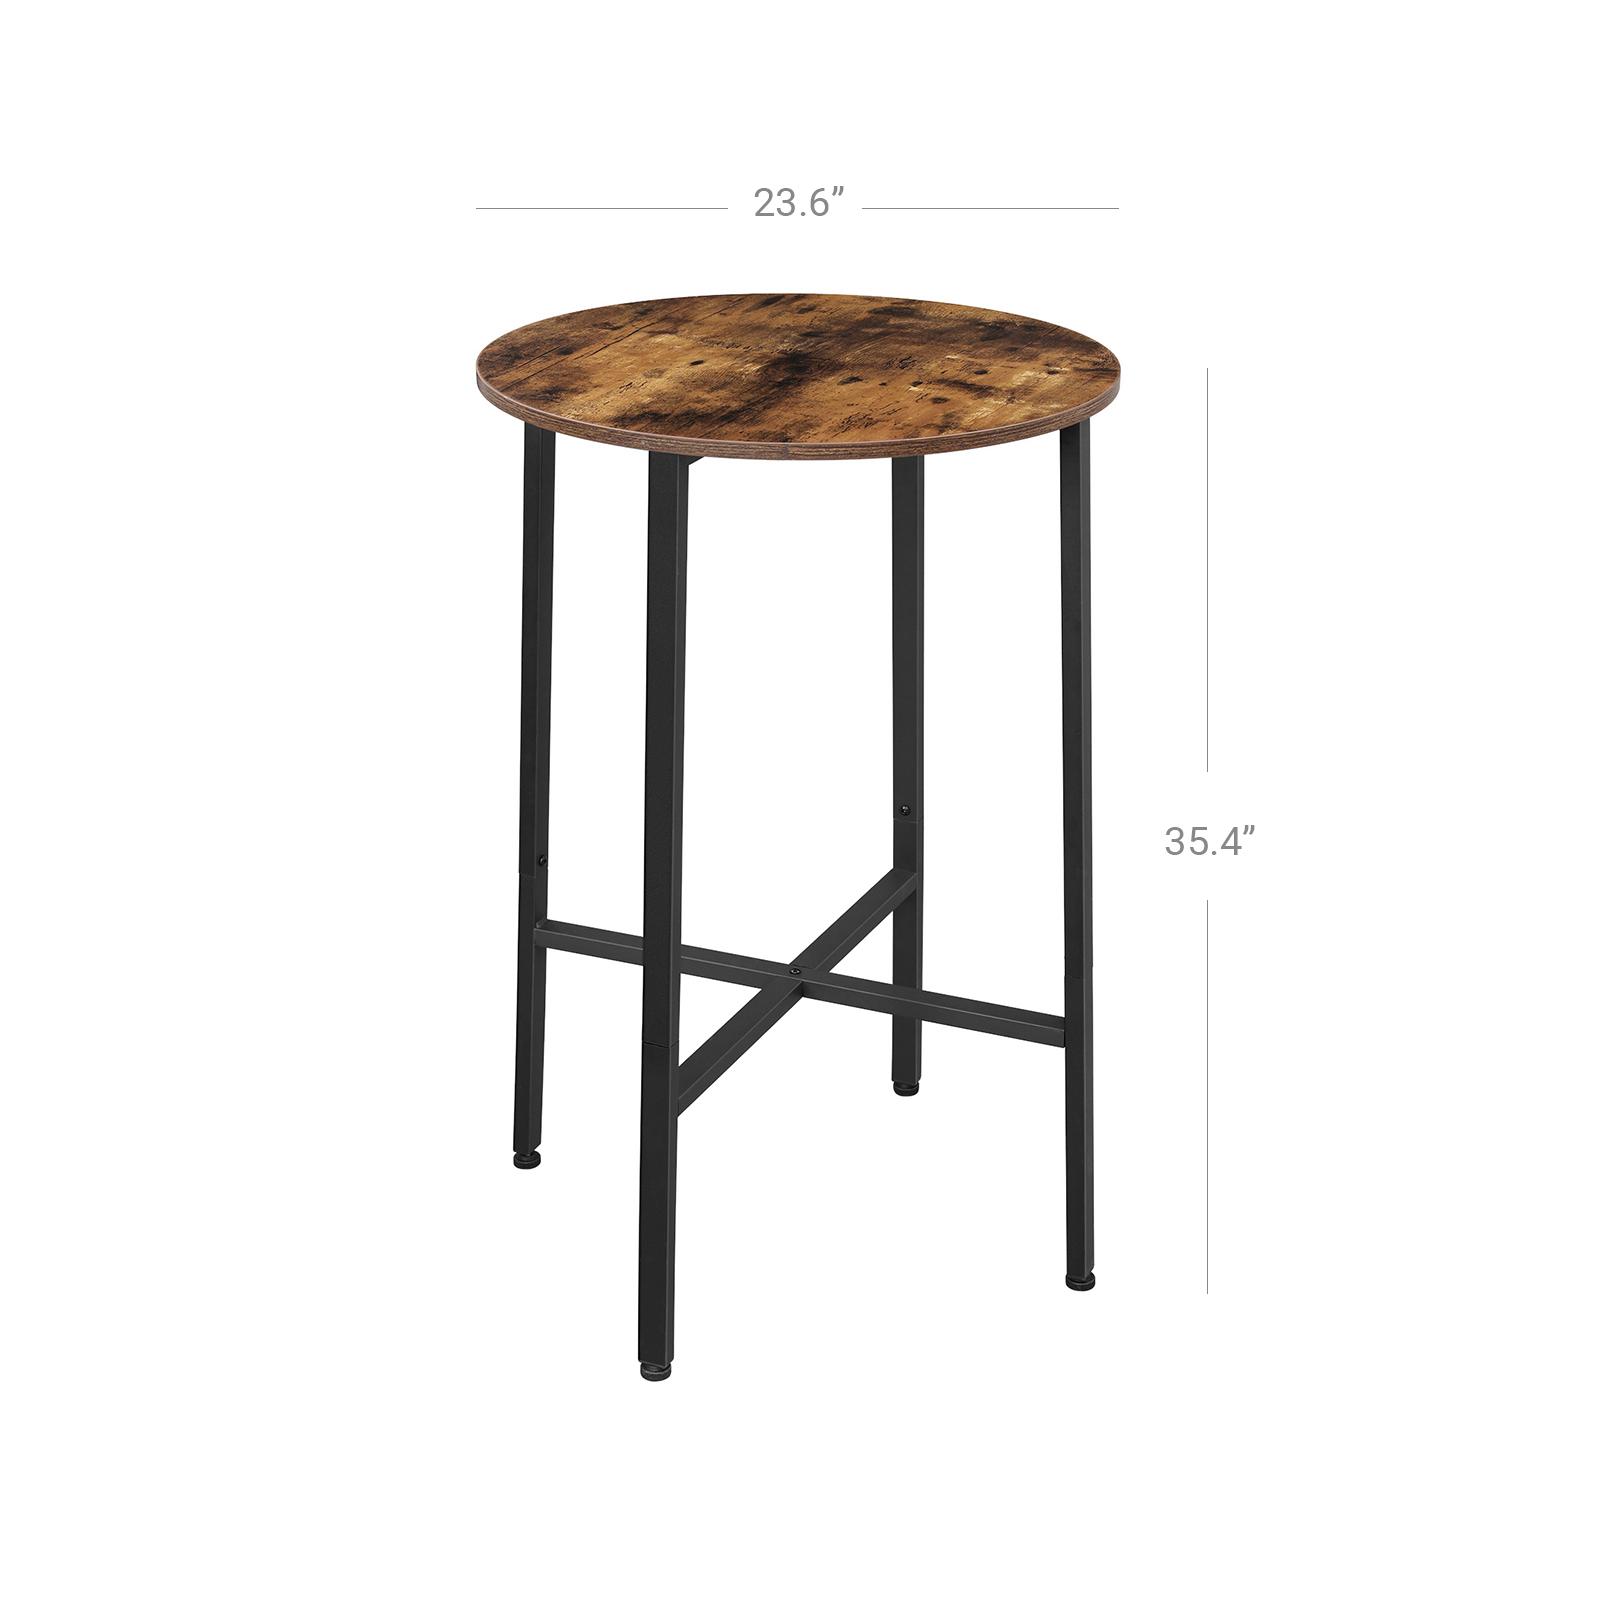 vasagle alinru bar table dining table hight pub table